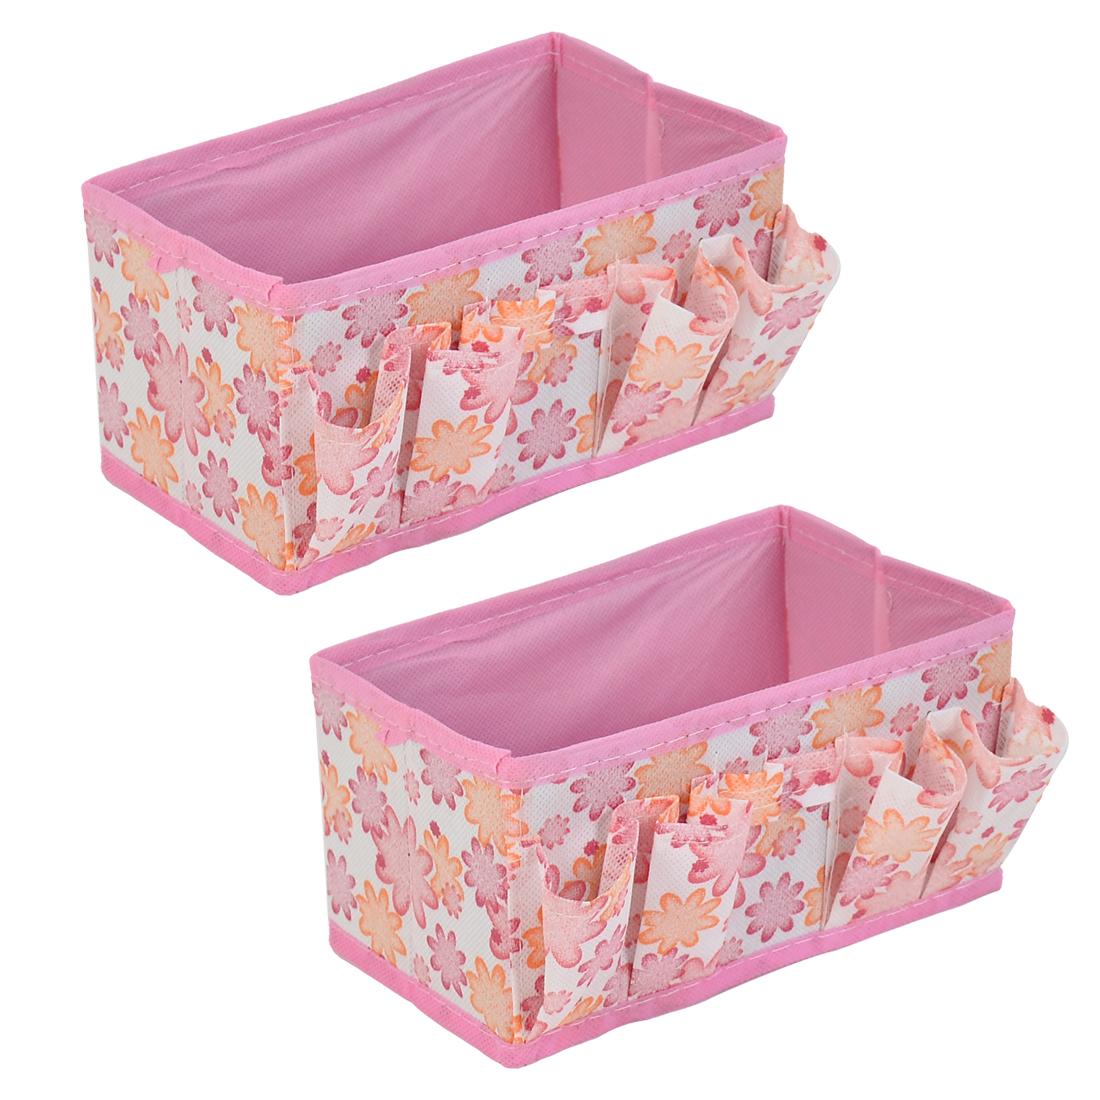 Bathroom Cosmetic Foldable Floral Pattern Storage Box Case Organizer Pink 2pcs